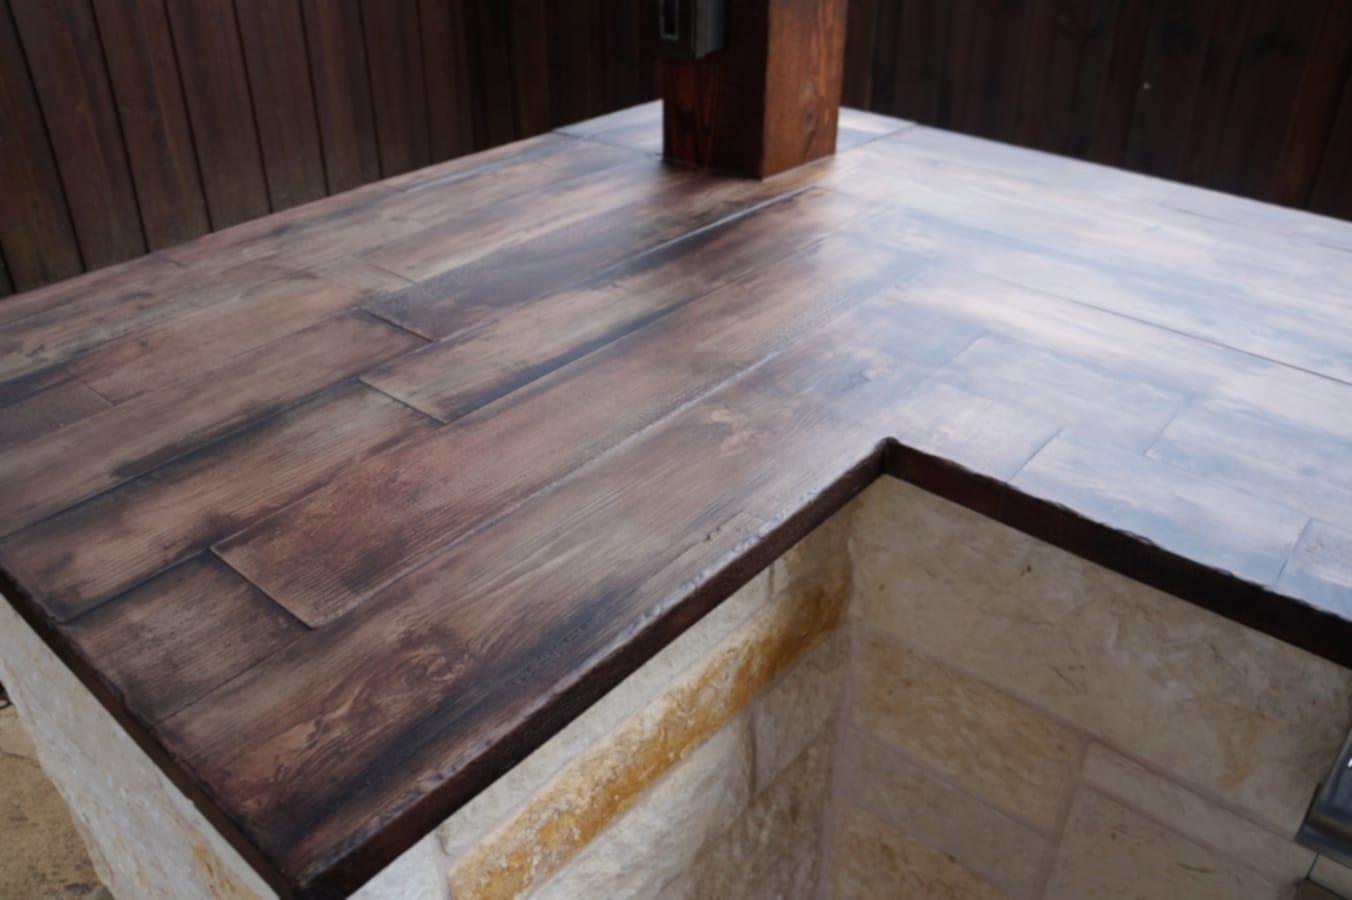 Custom Wood Look Concrete Countertops for an outdoor kitchen